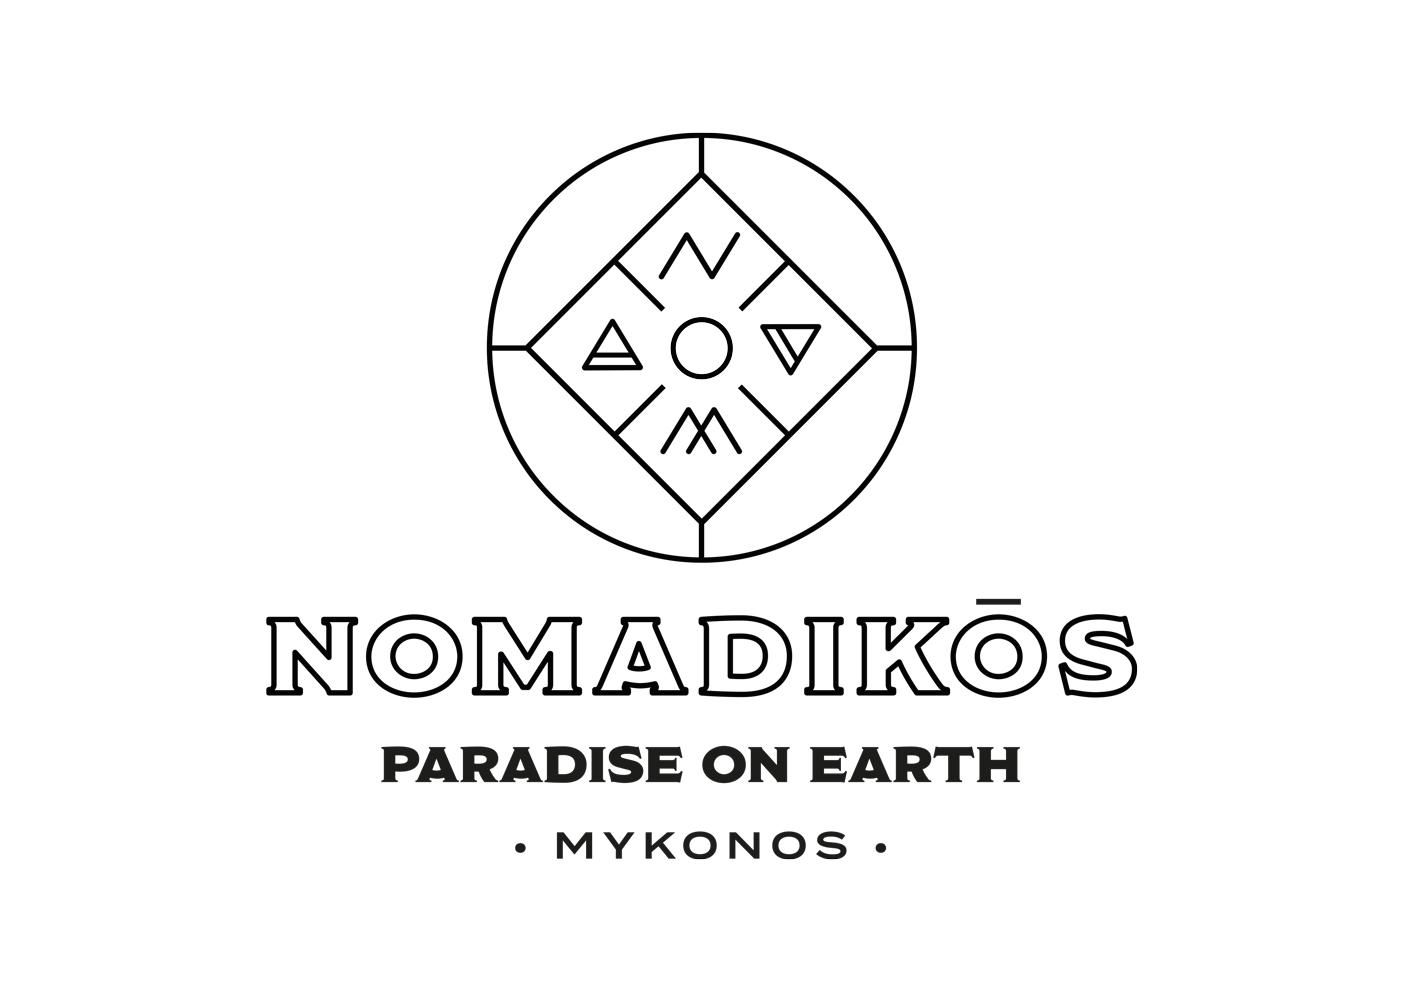 nomadikos_concept2.jpg